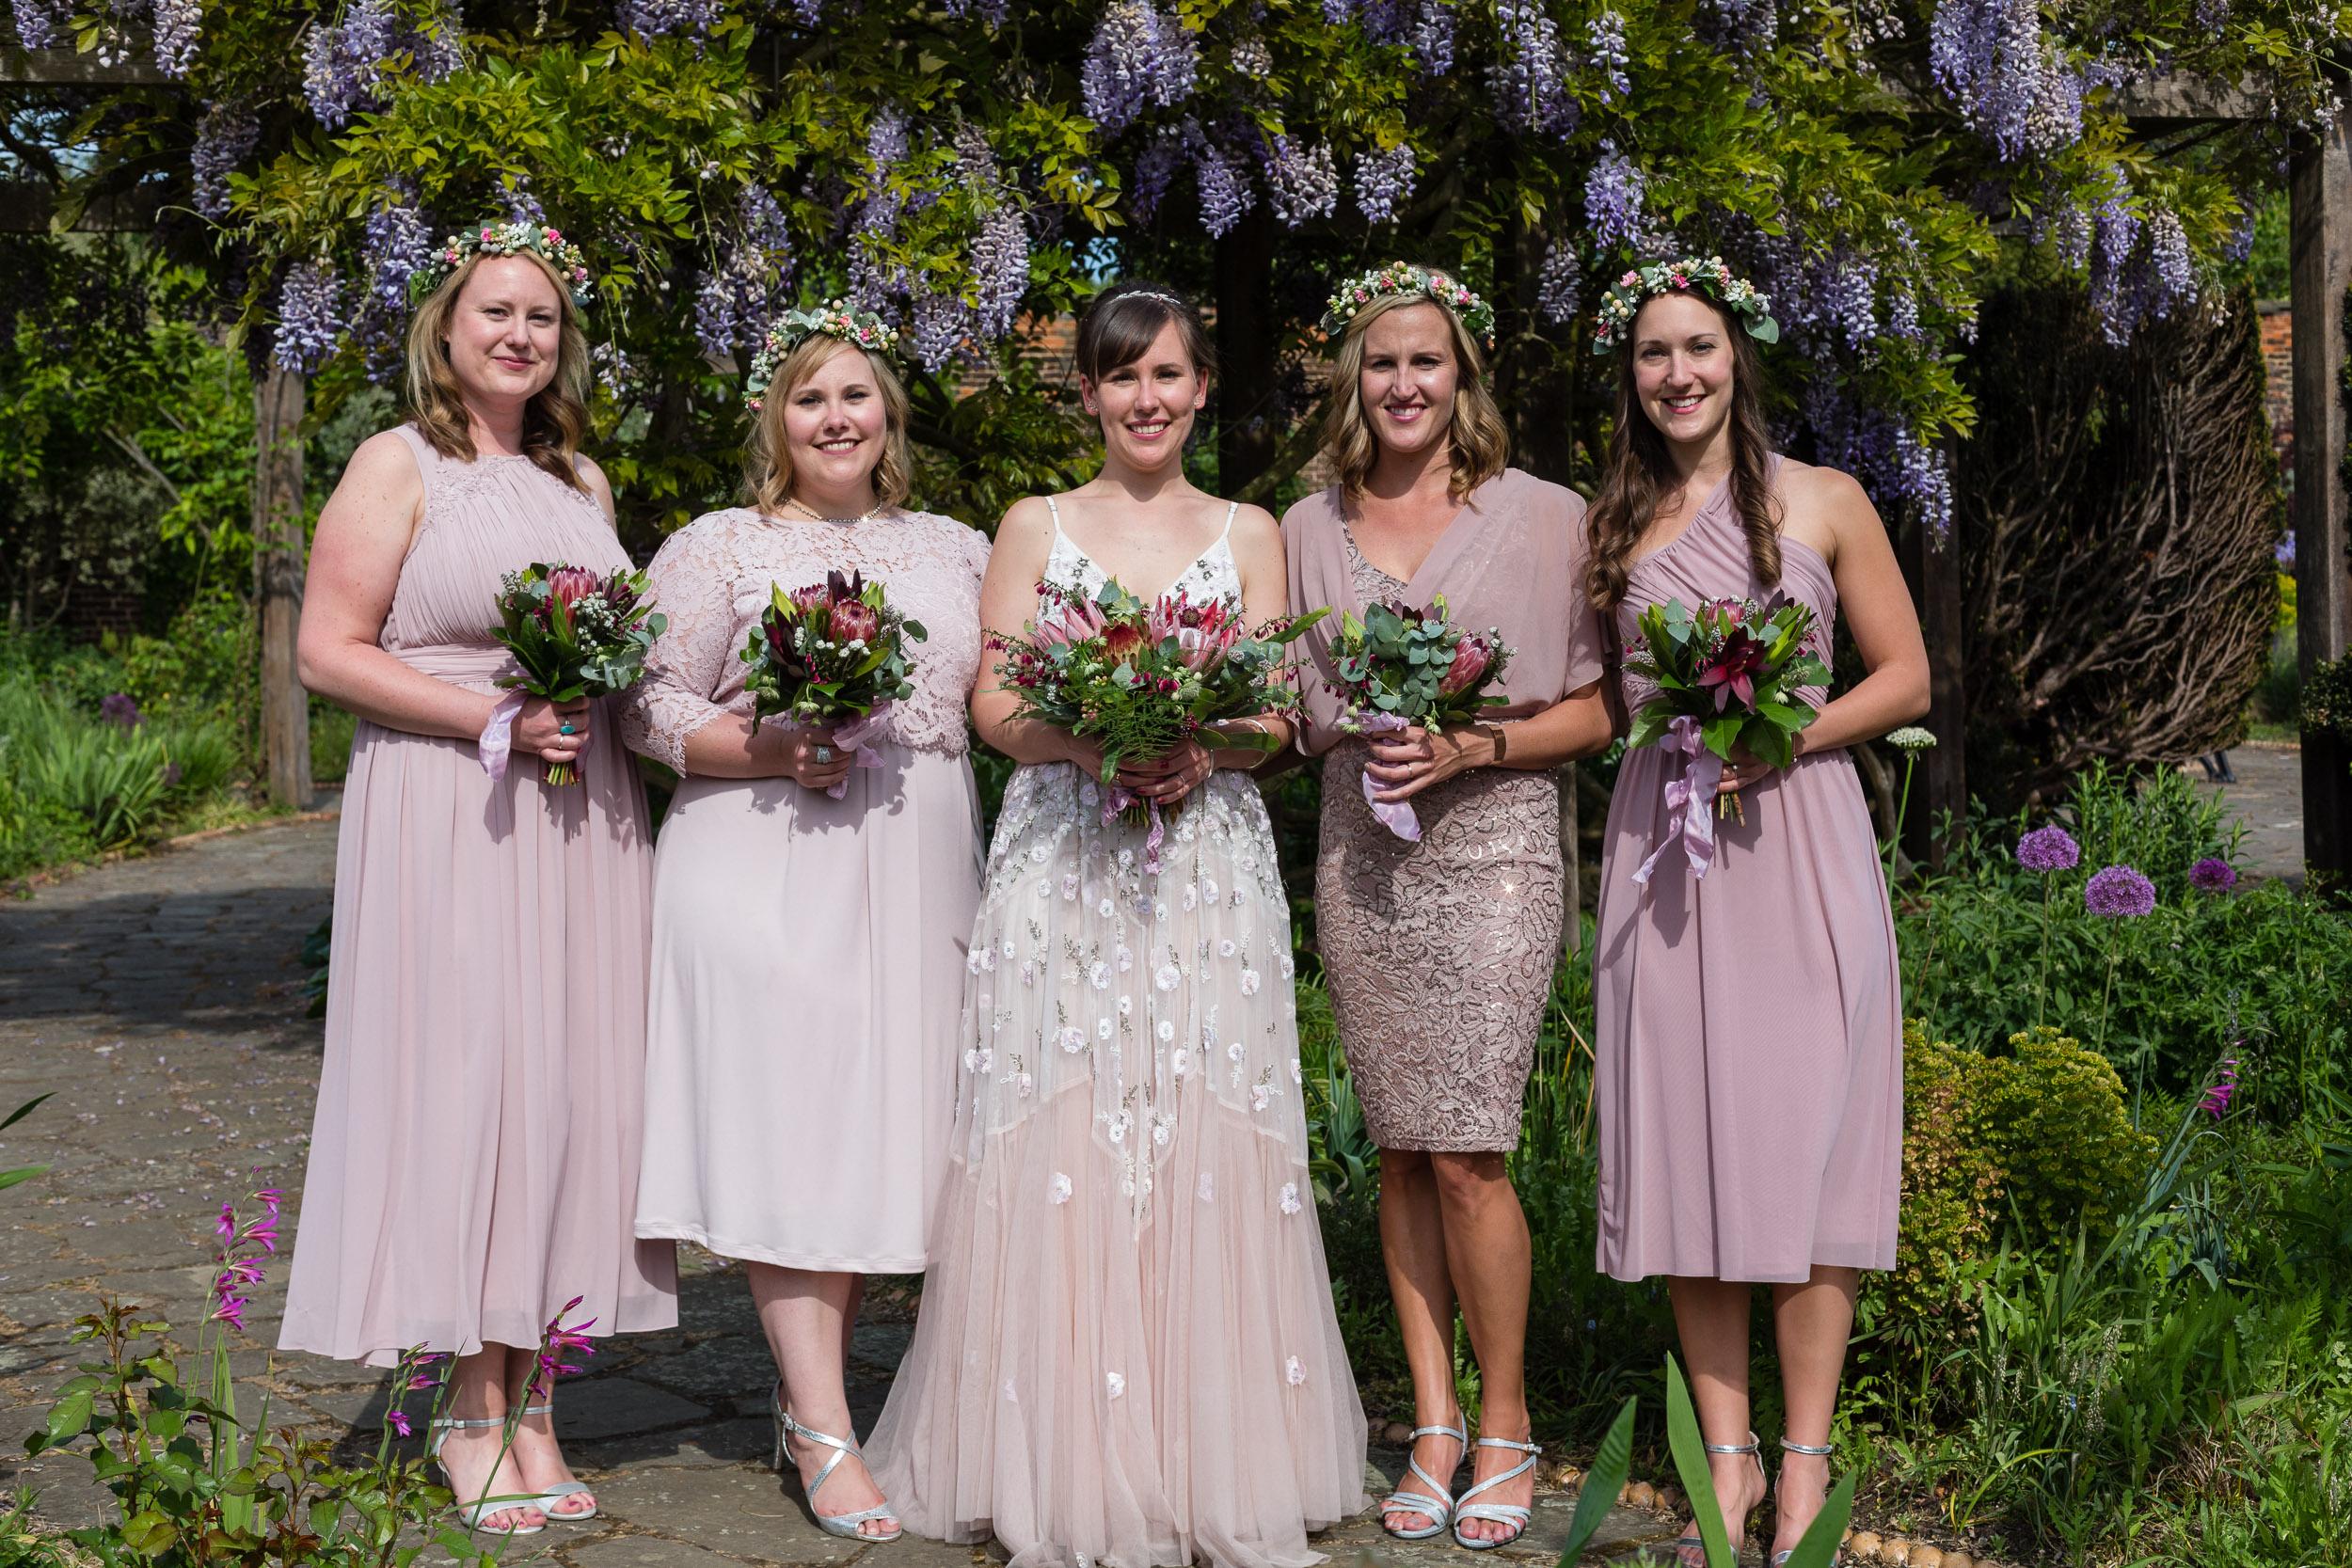 brockwell-lido-brixton-herne-hill-wedding-262.jpg